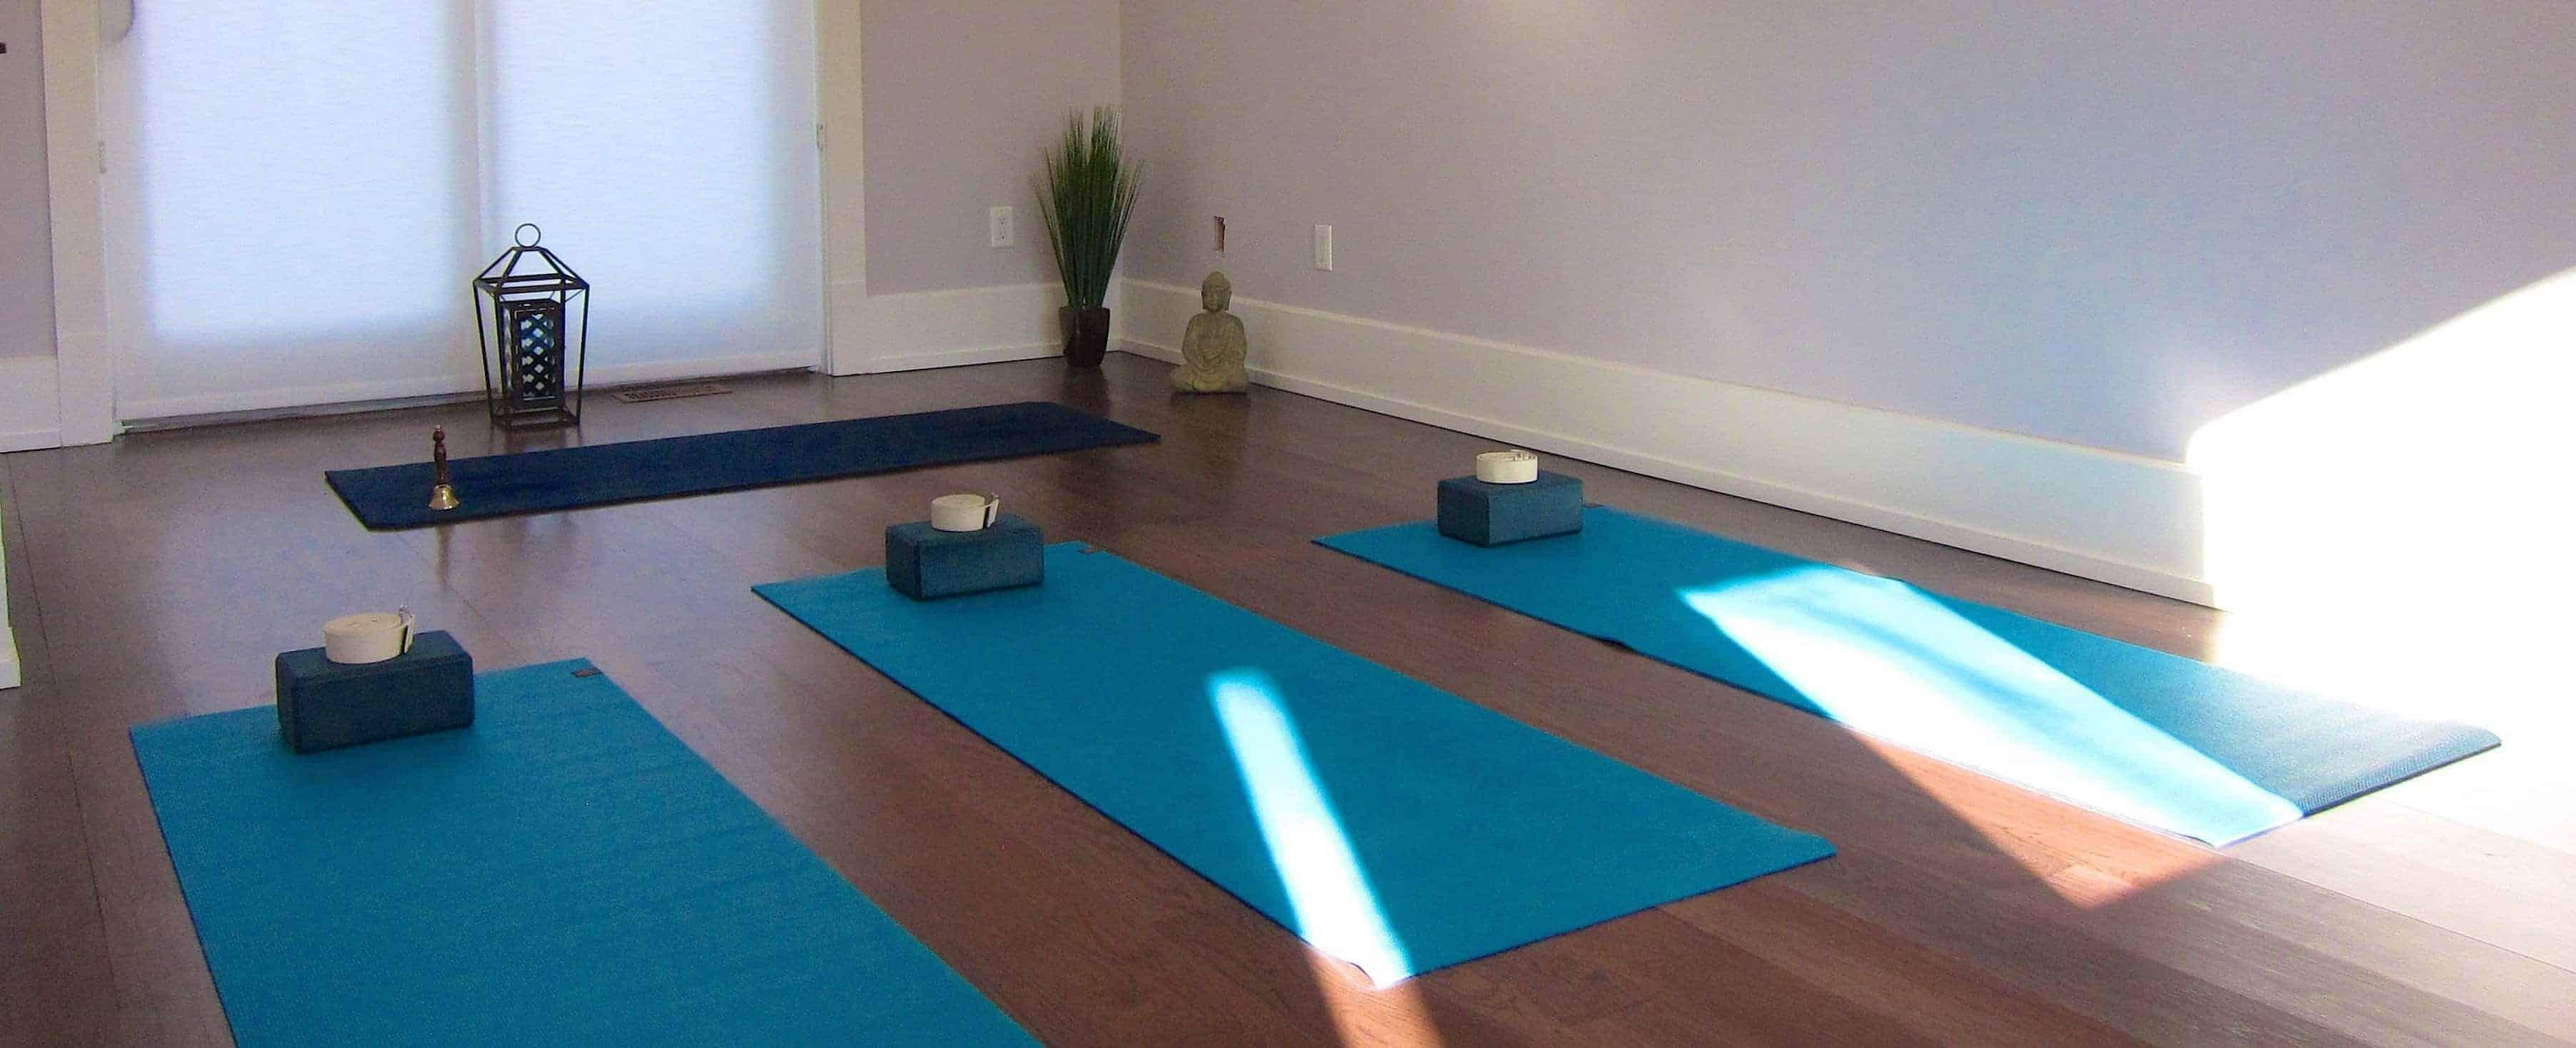 Lenore's Group Yoga Classes